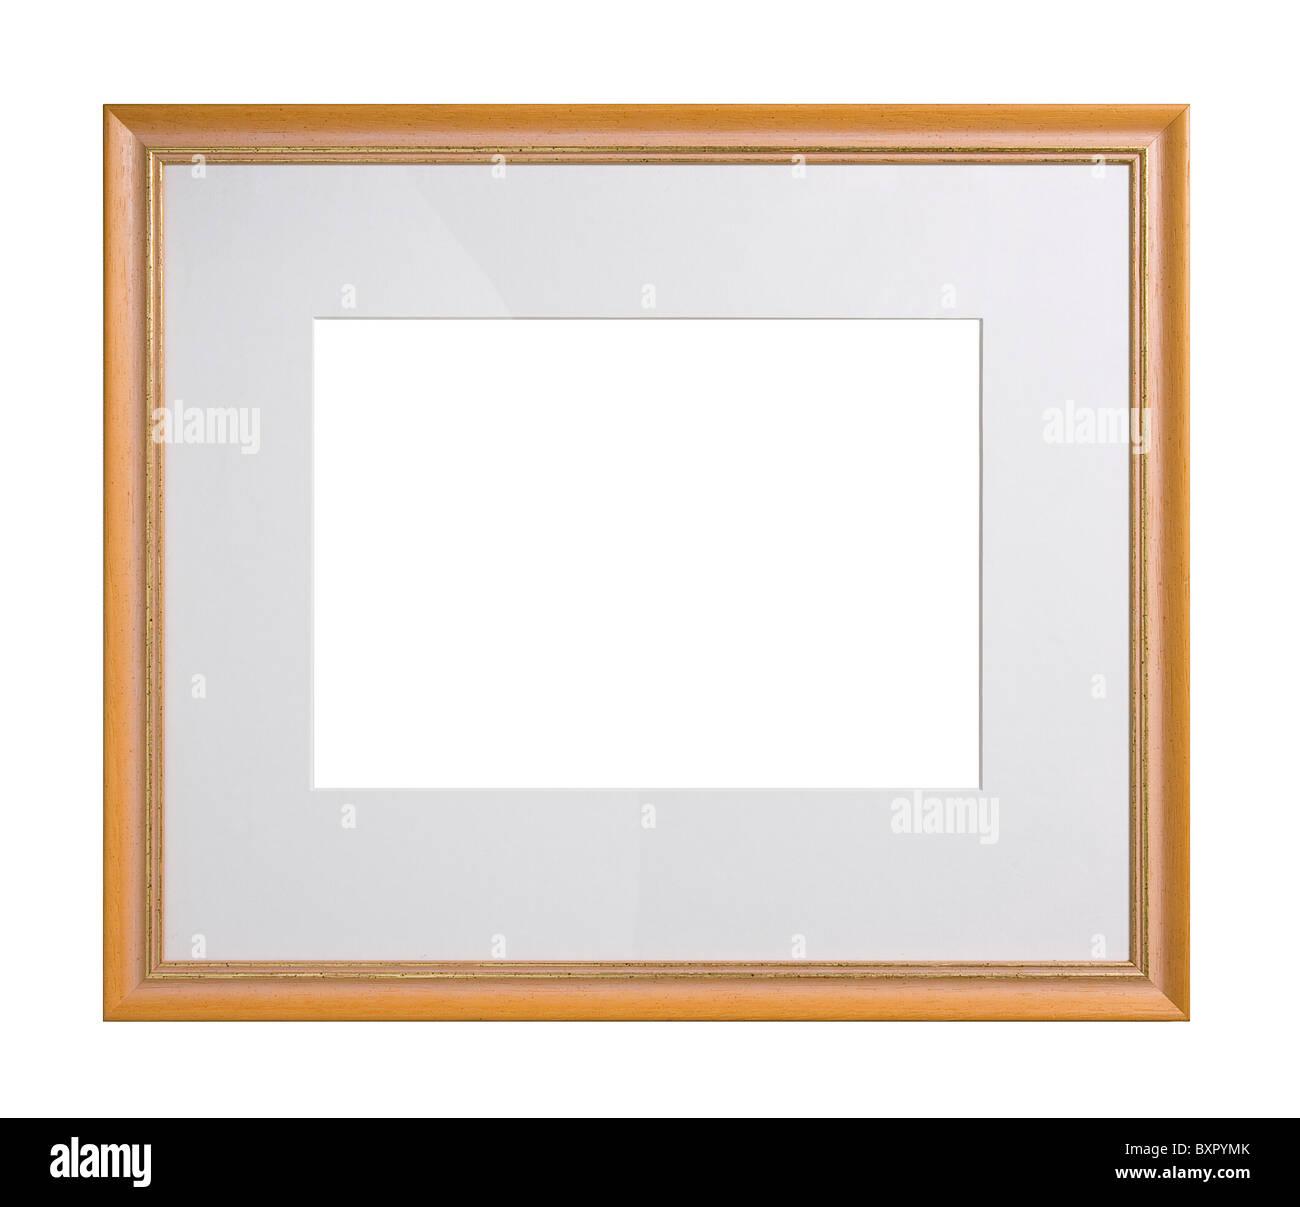 Wall Cut Out Stockfotos & Wall Cut Out Bilder - Alamy